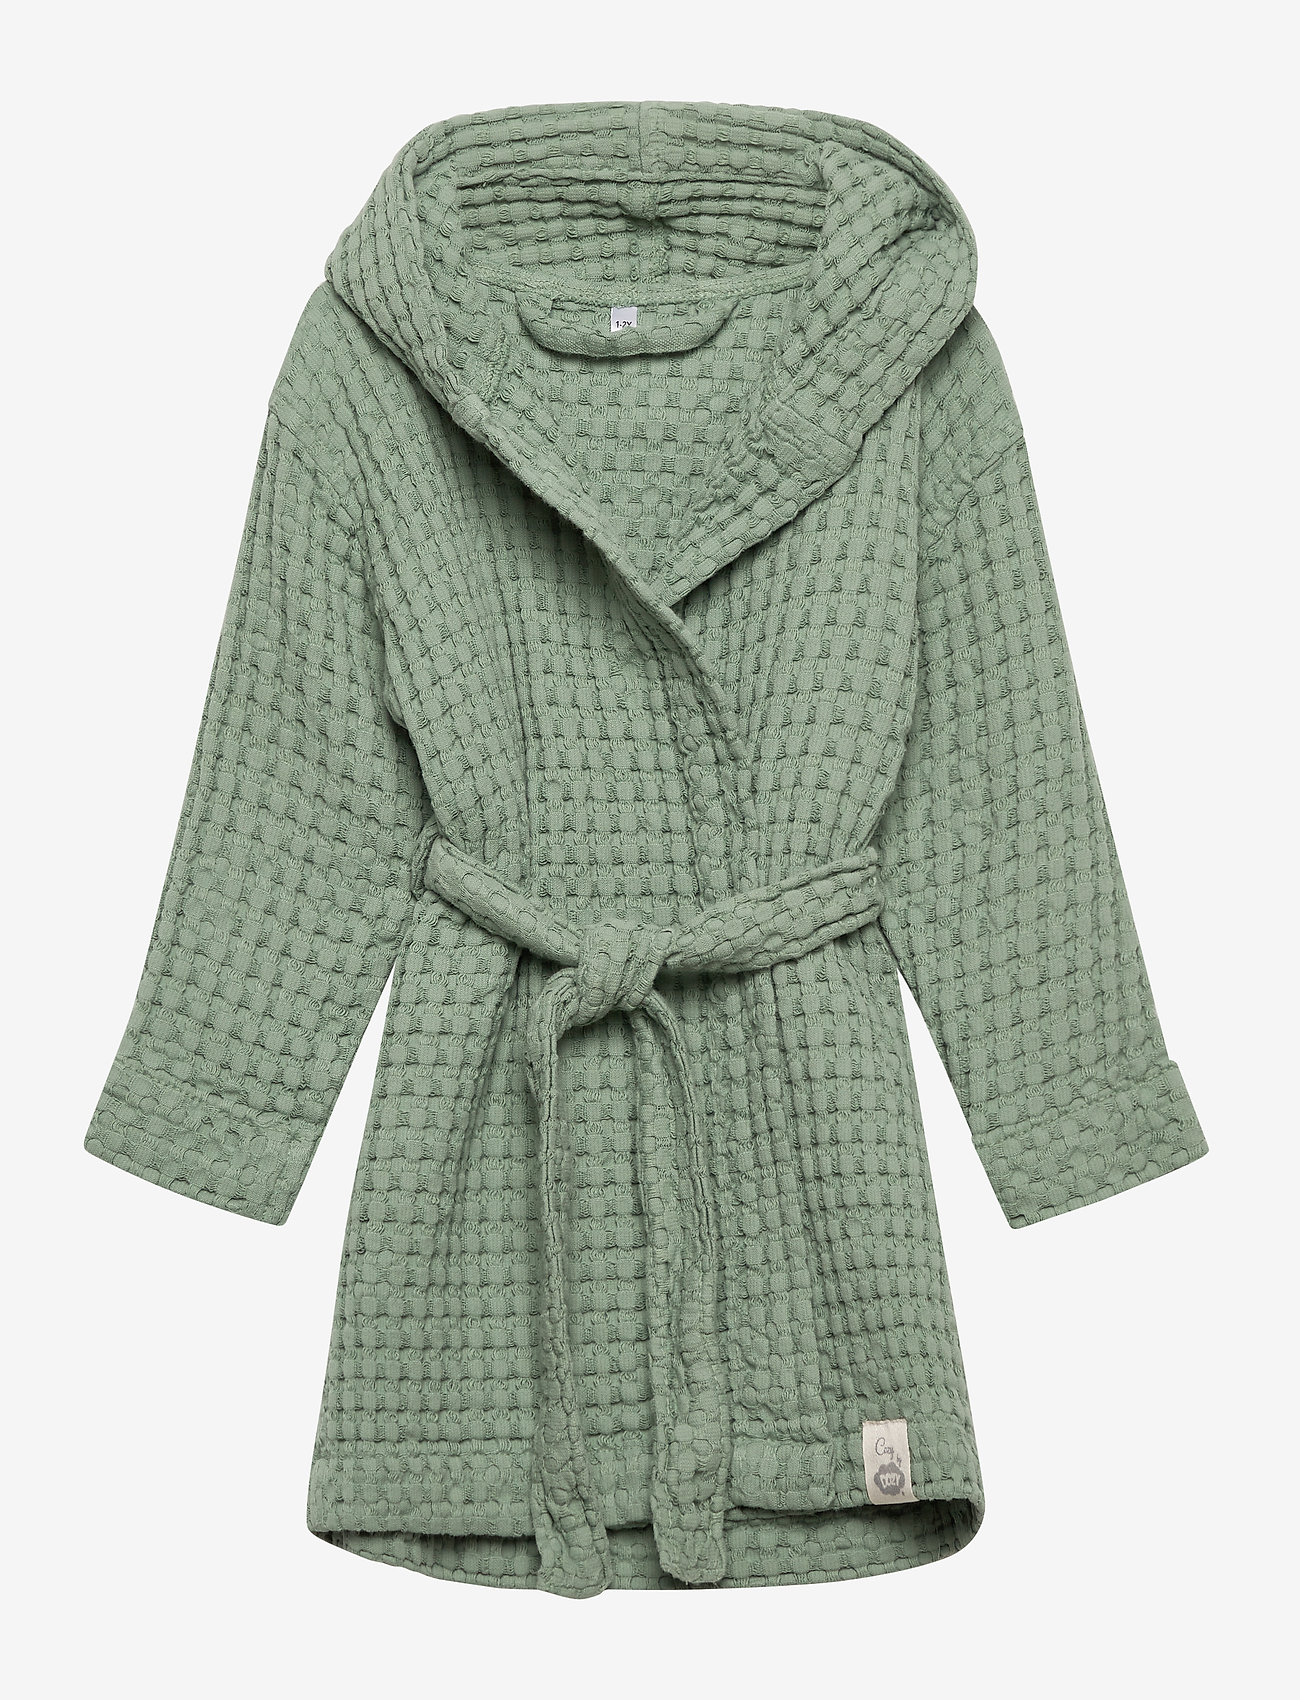 Cozy by Dozy - Cozy by Dozy Bath Robe - bathrobes - green - 0